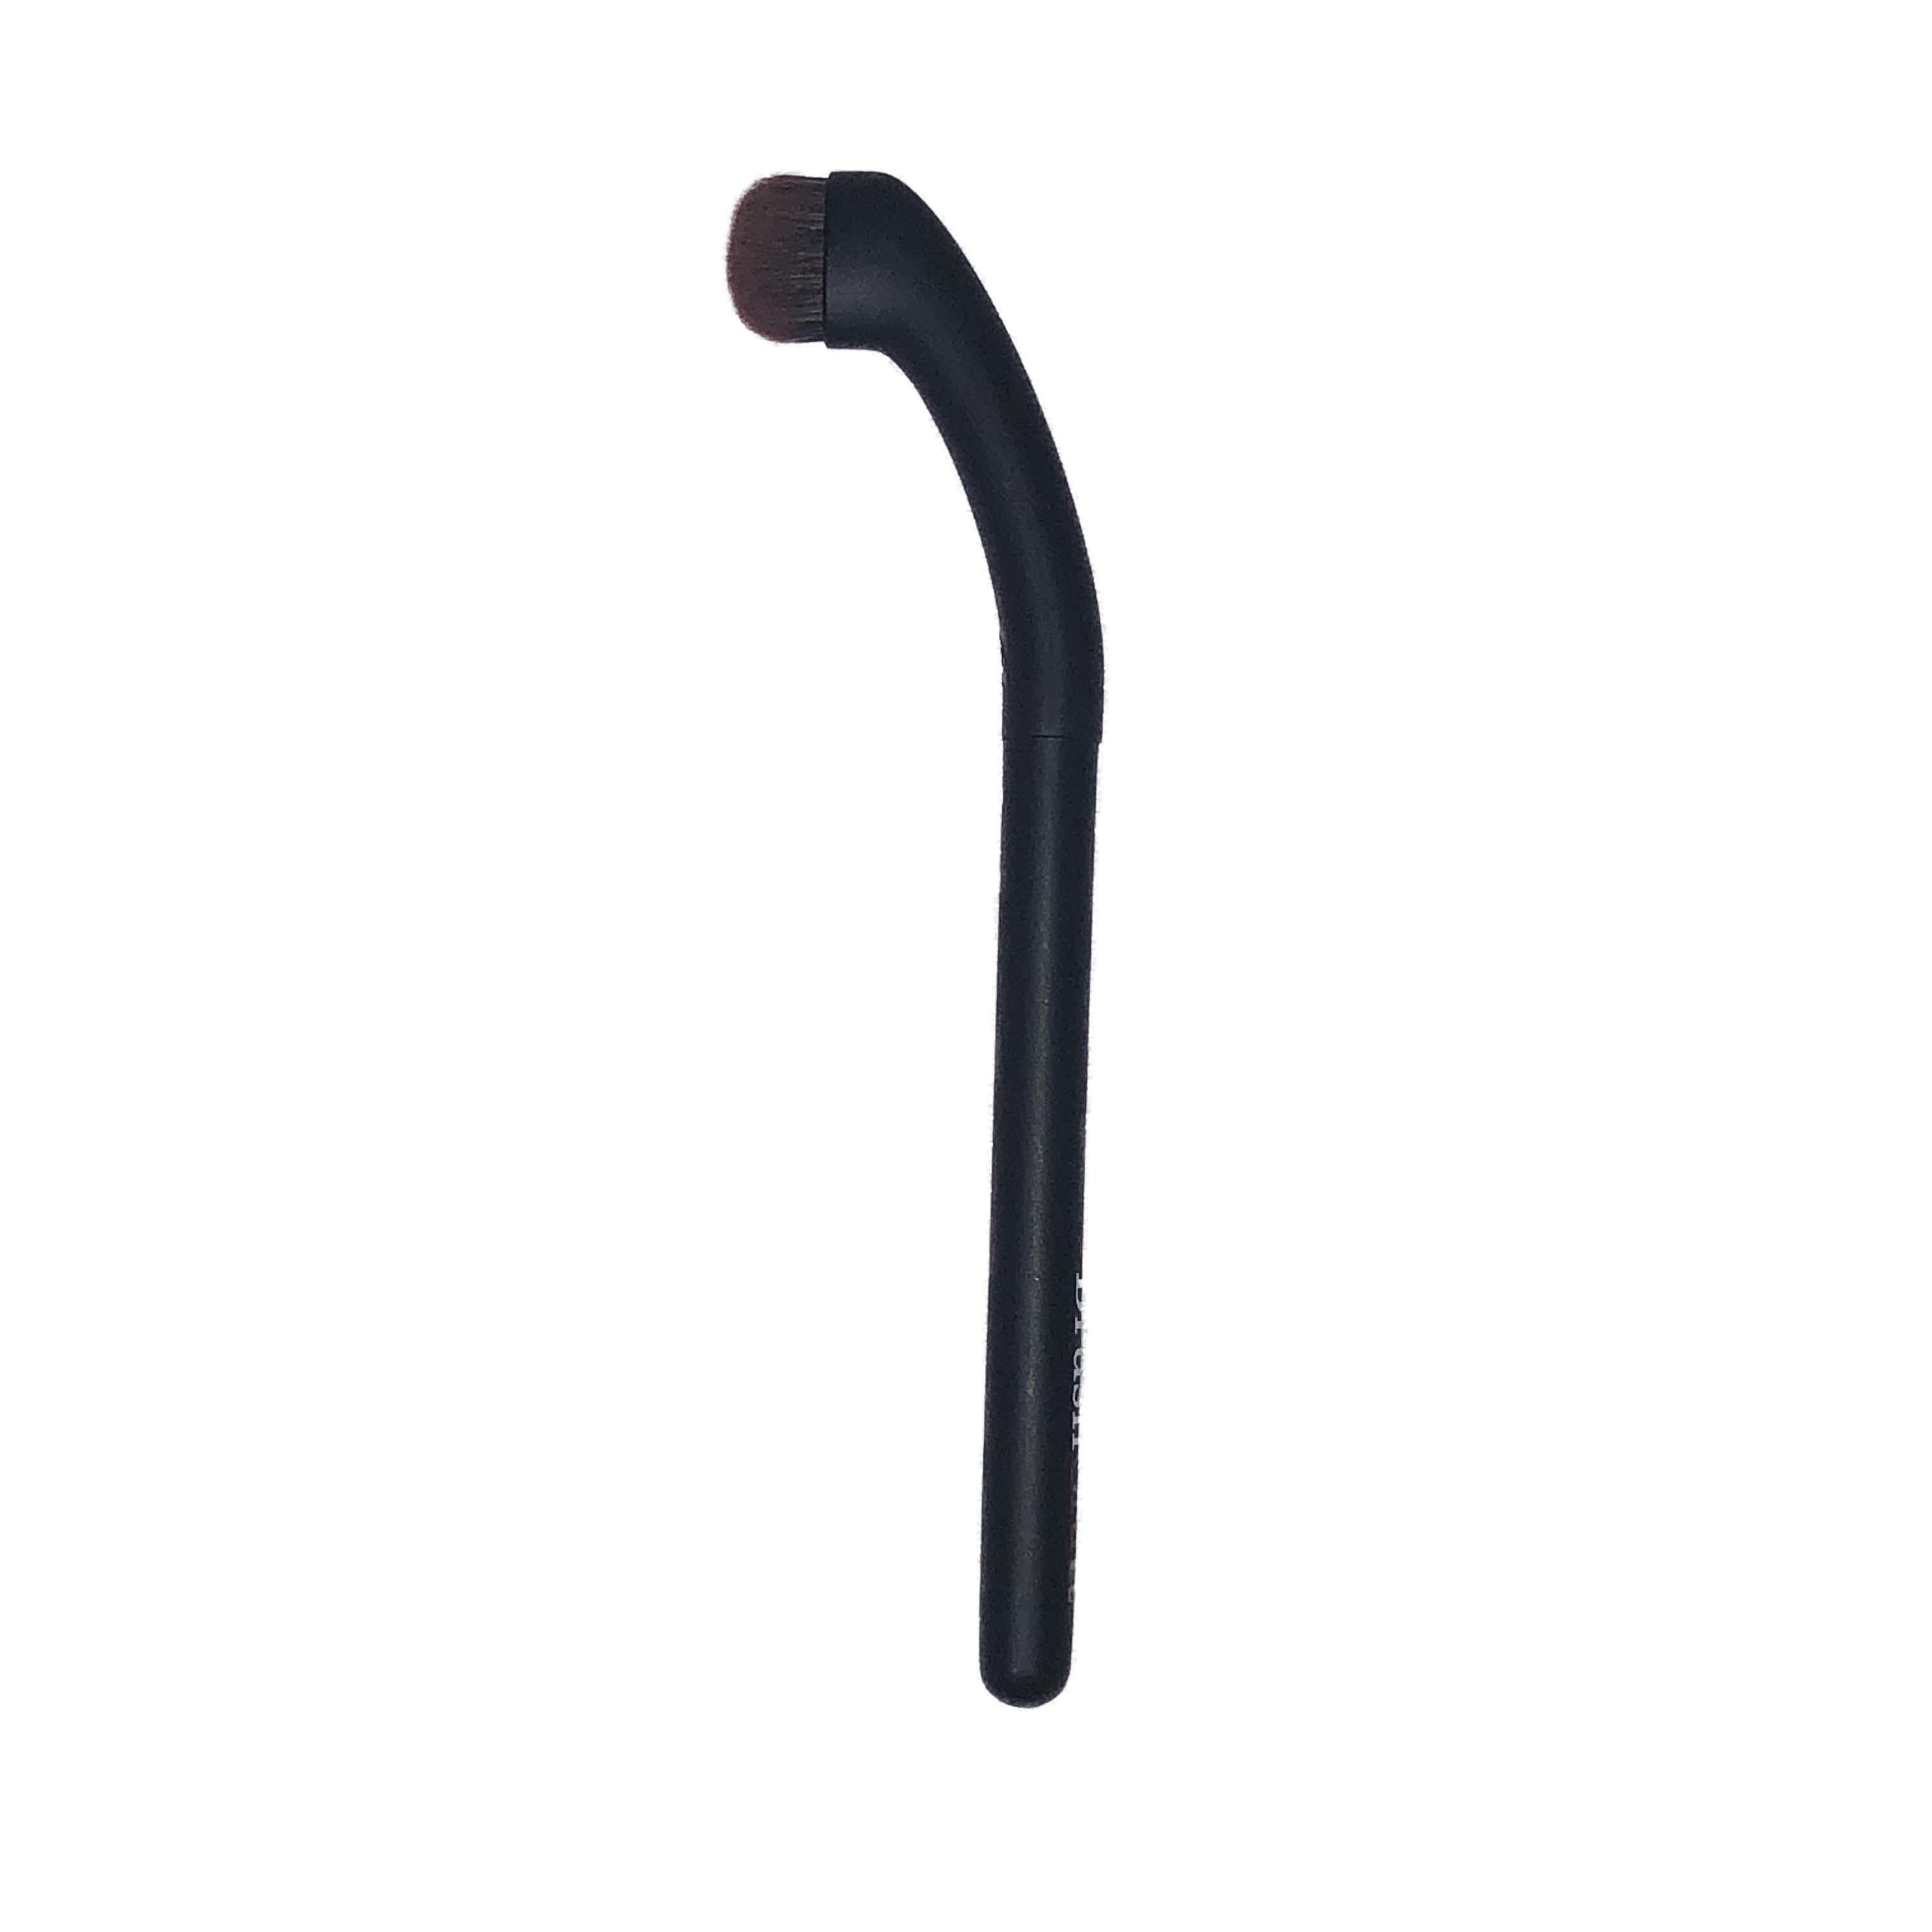 BrushCraft Oval 3 Perfecting Face Brush Black